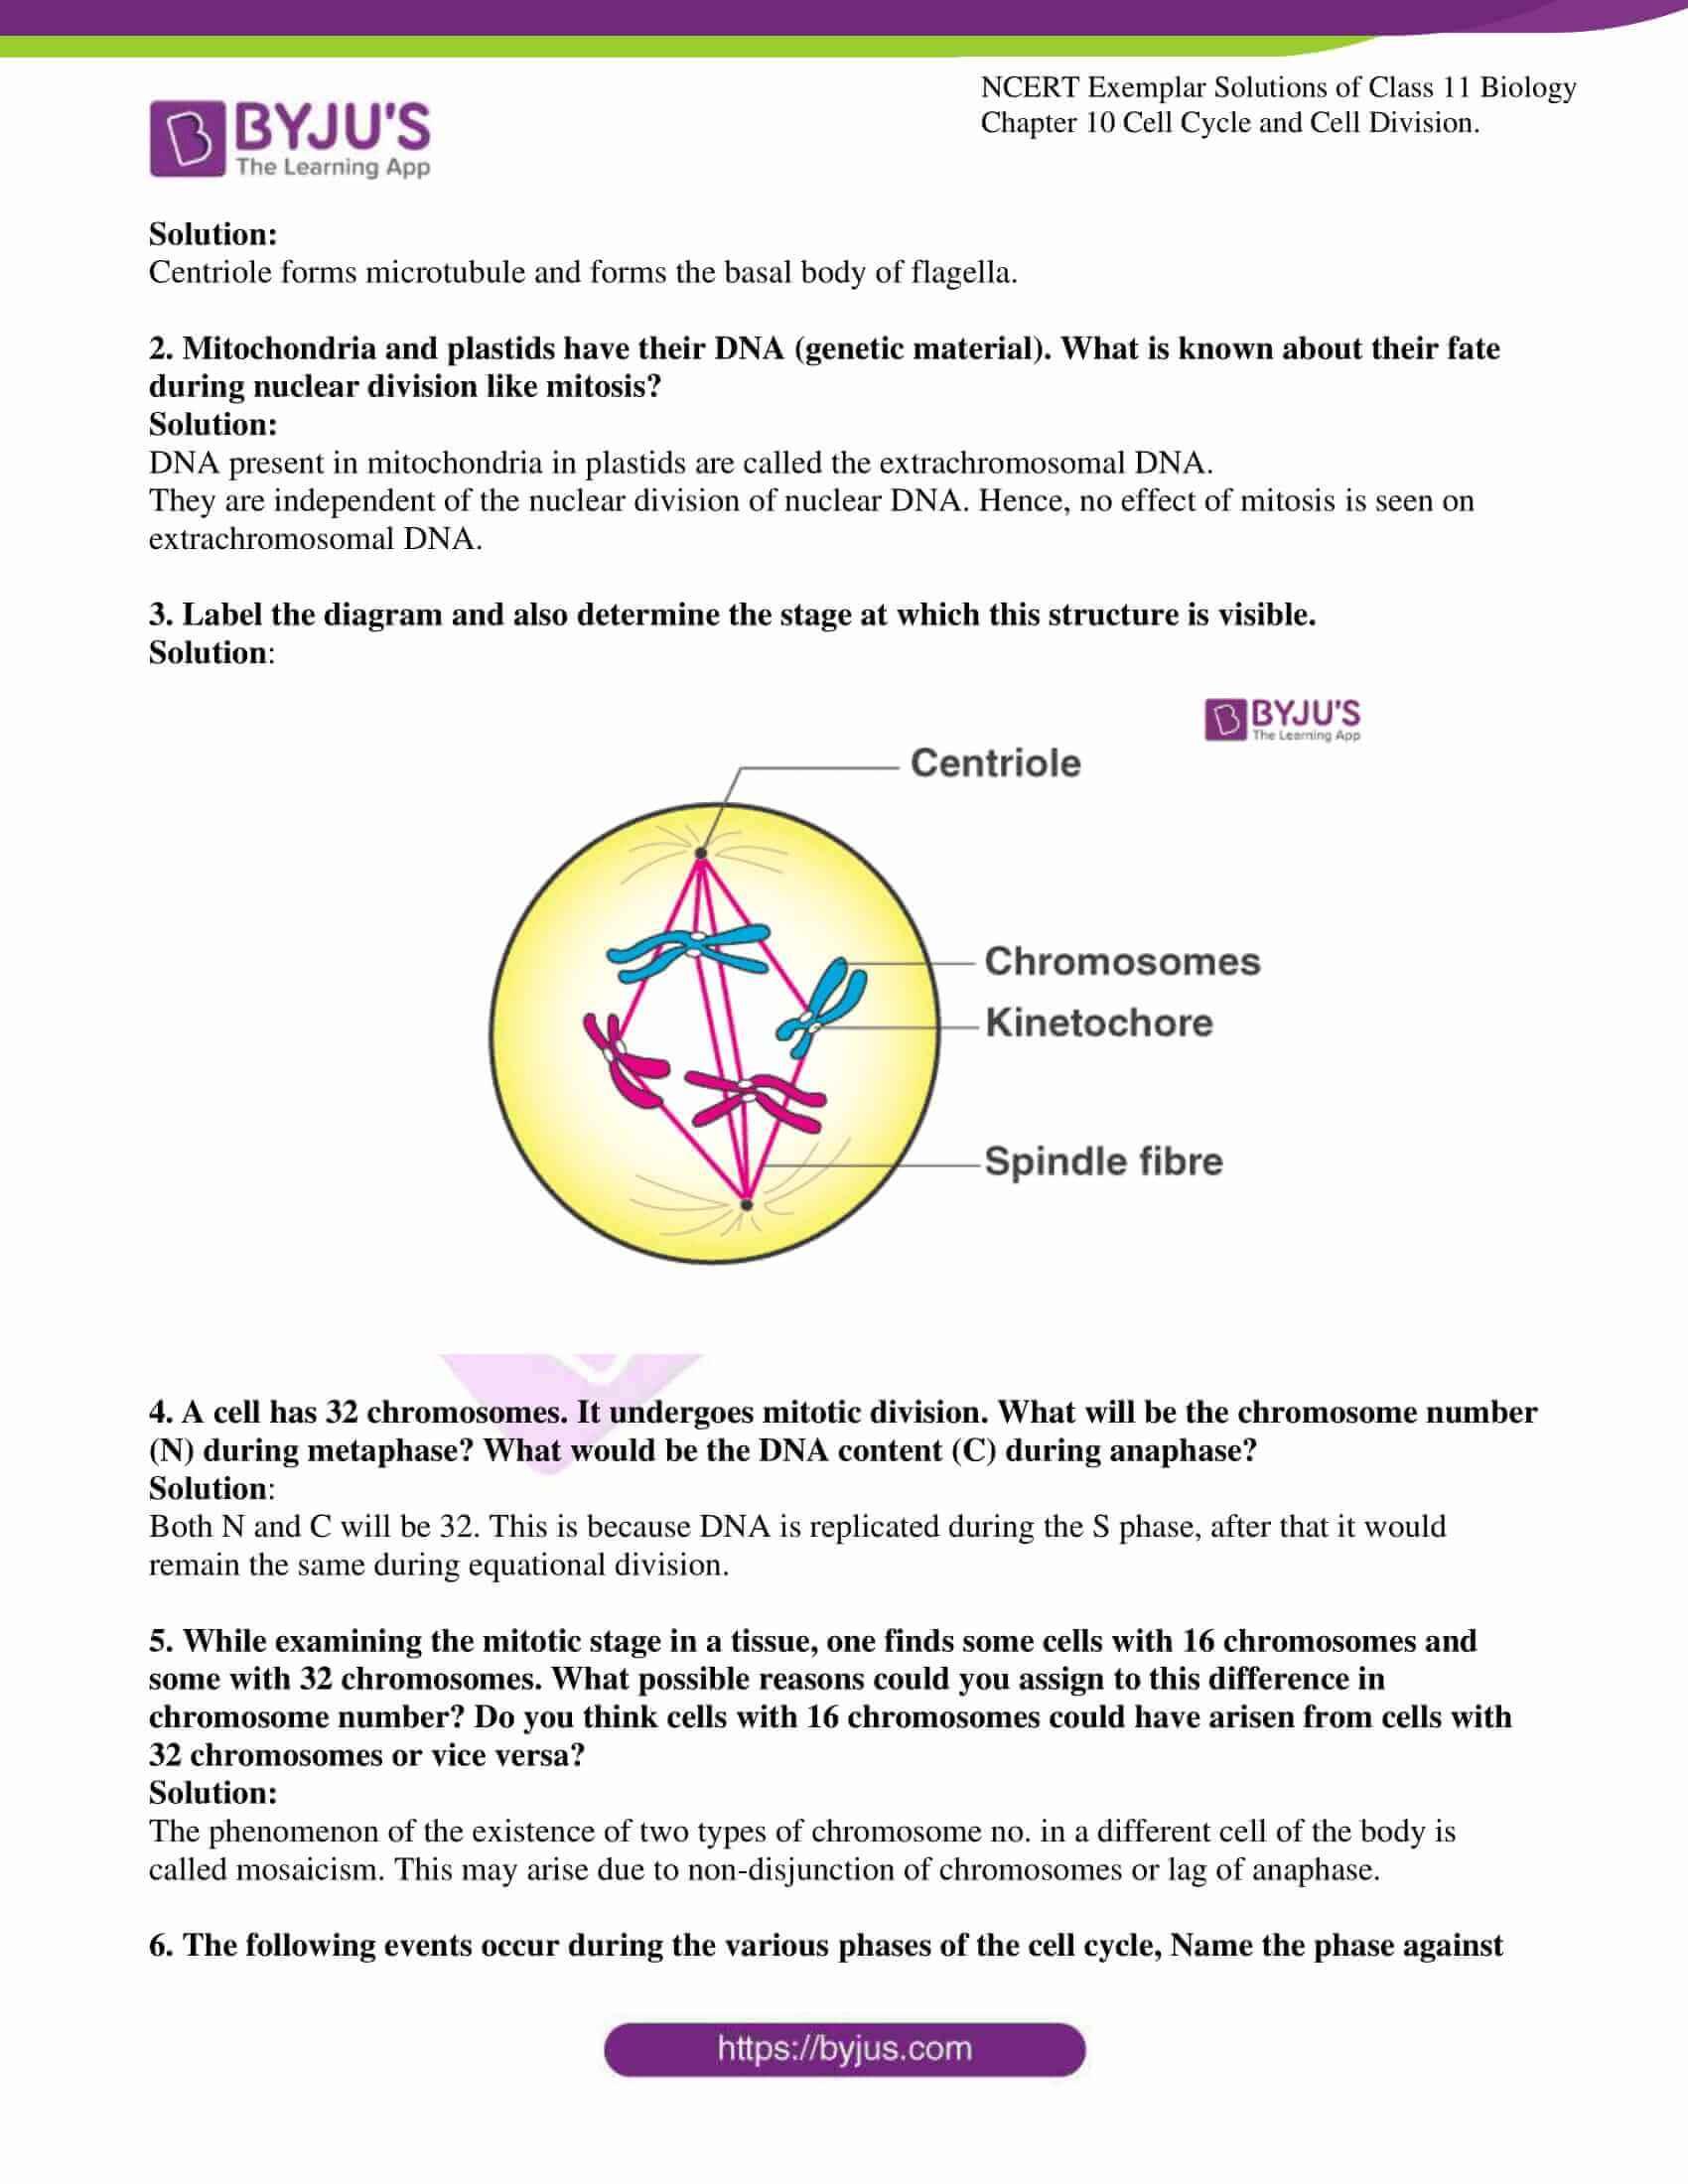 ncert exemplar solutions for class 11 bio chapter 10 5